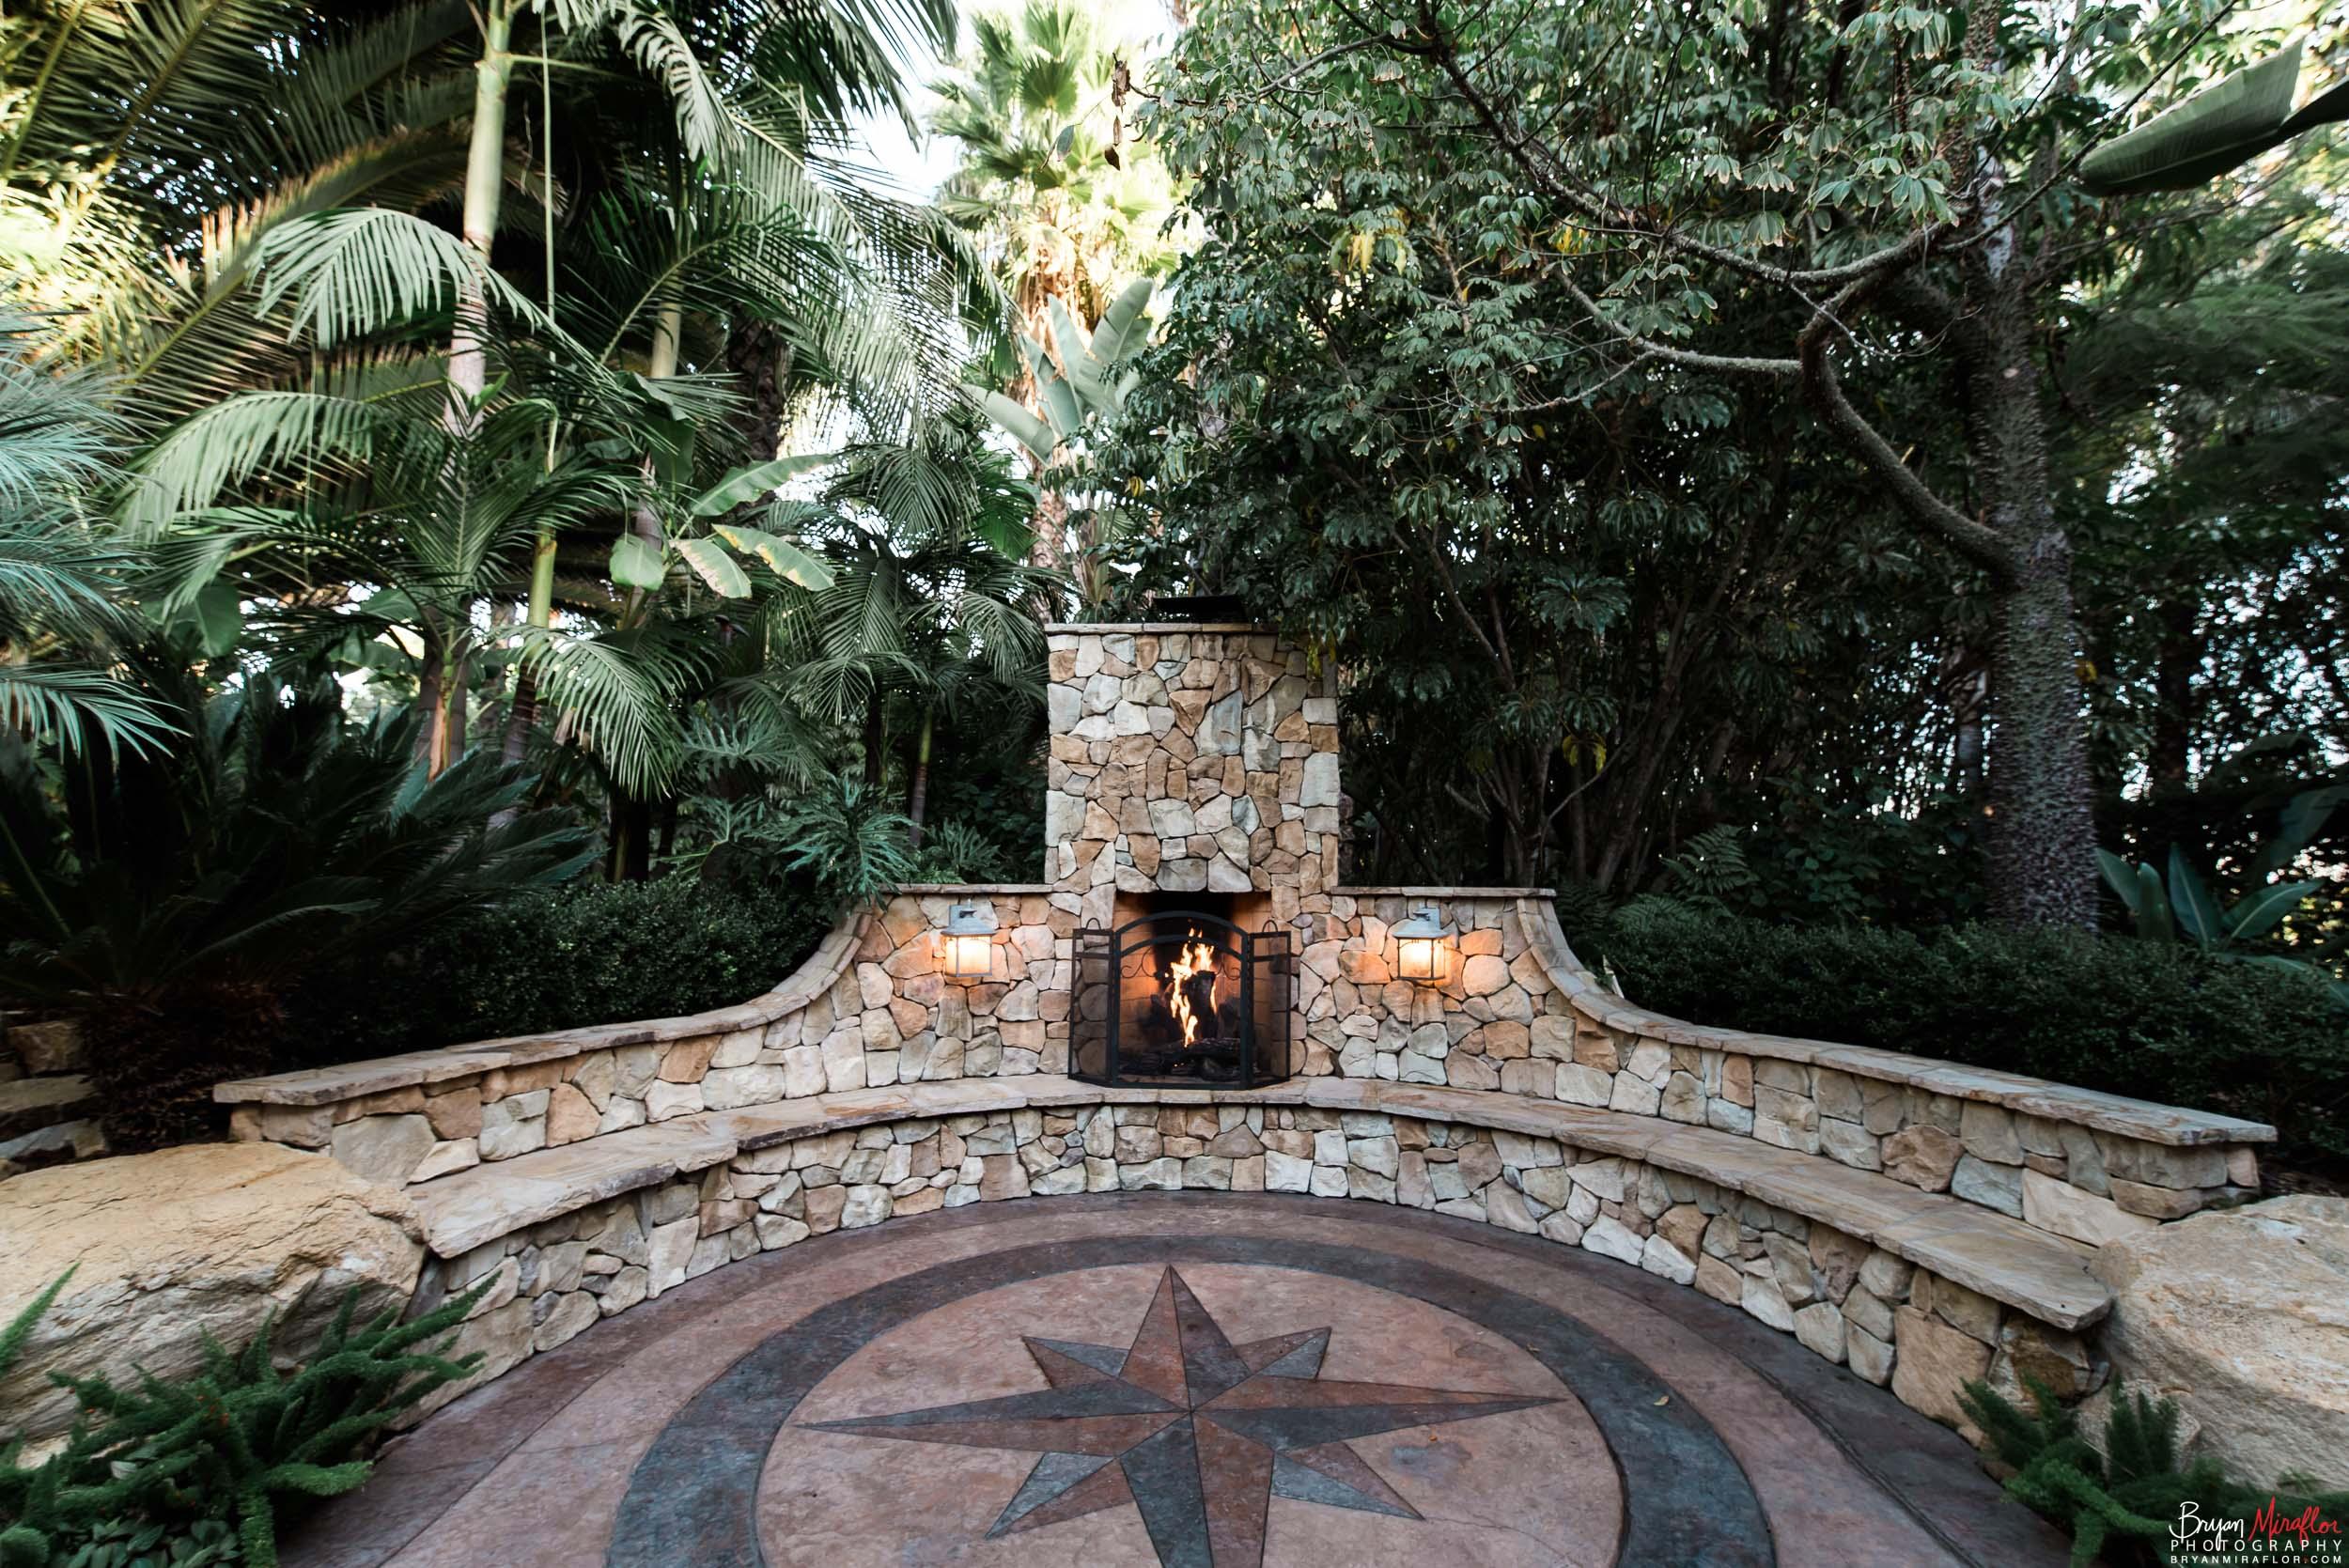 Bryan-Miraflor-Photography-Hannah-Jonathan-Married-Grand-Traditions-Estate-Gardens-Fallbrook-20171222-160.jpg